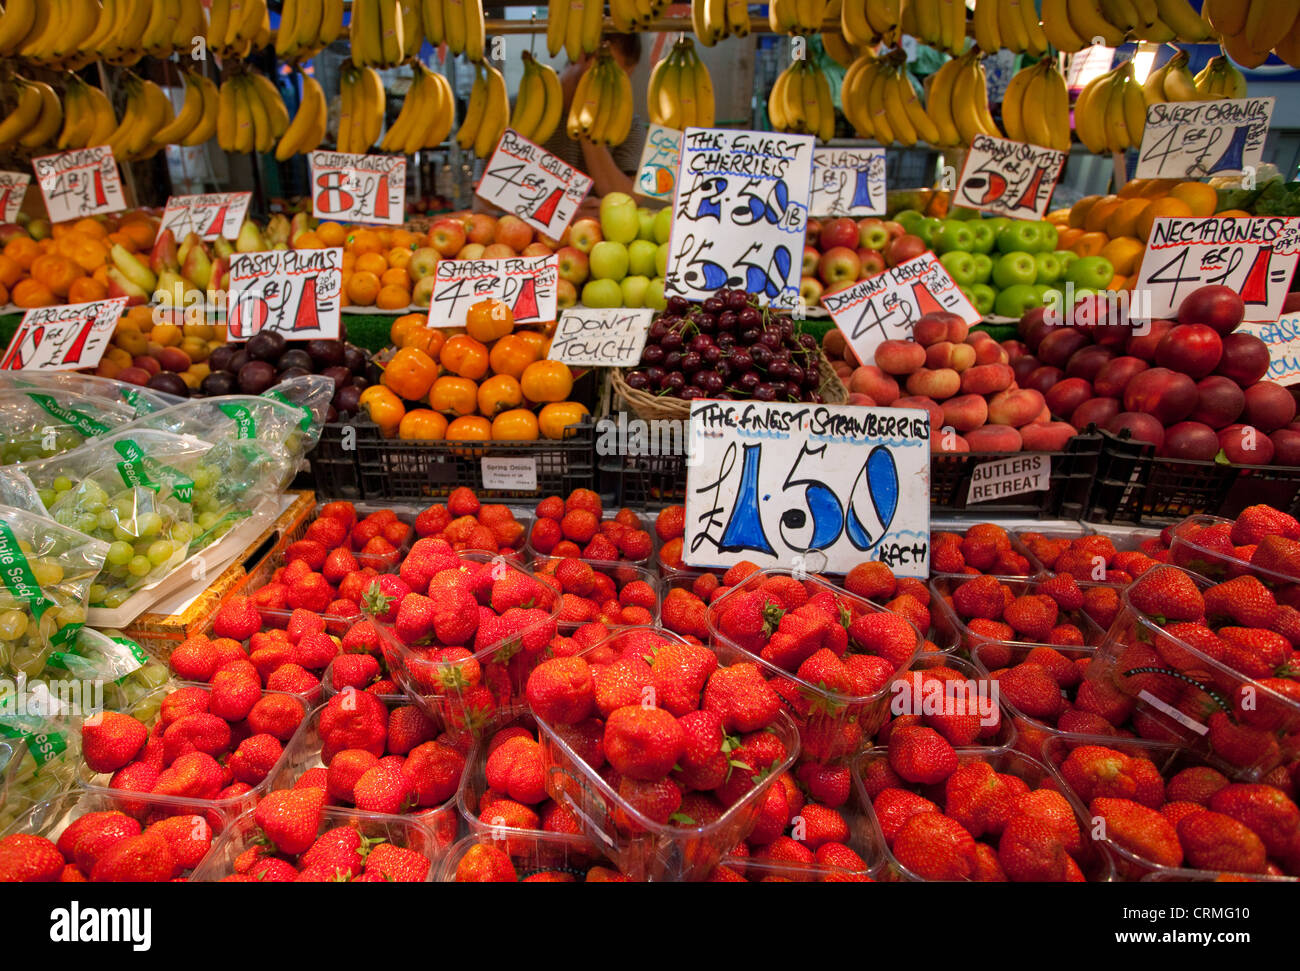 Display of fruit in London greengrocers - Stock Image